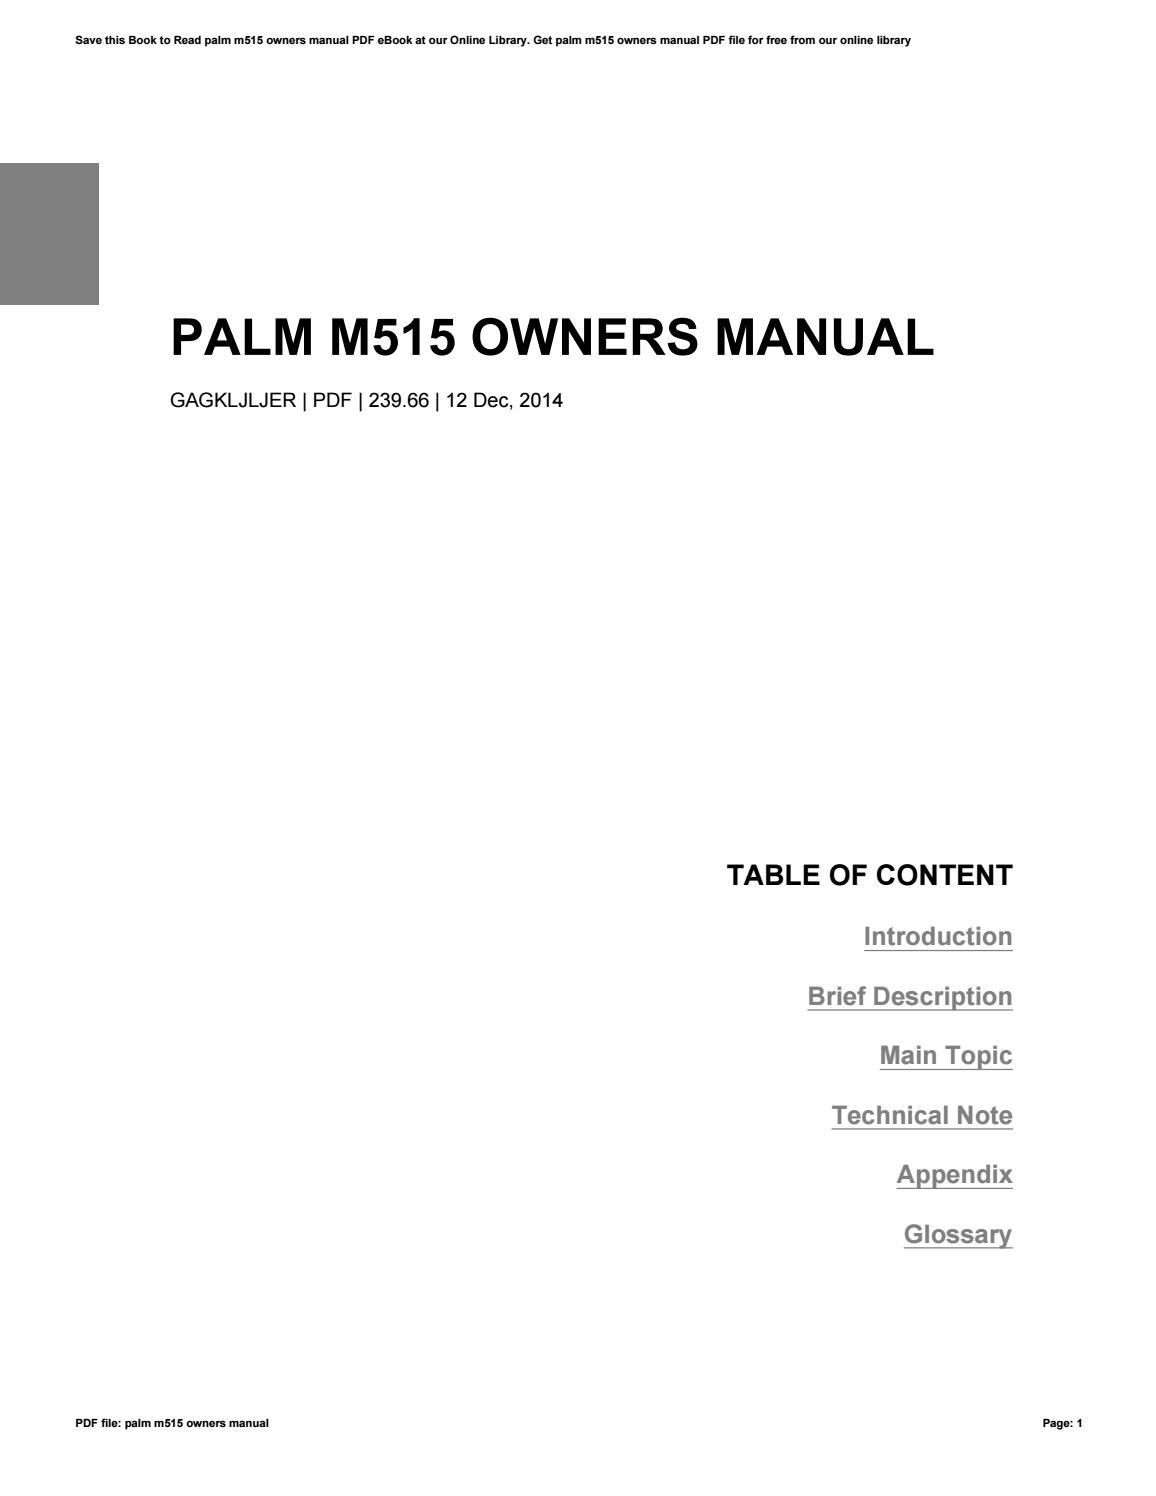 PALM M515 MANUAL DOWNLOAD